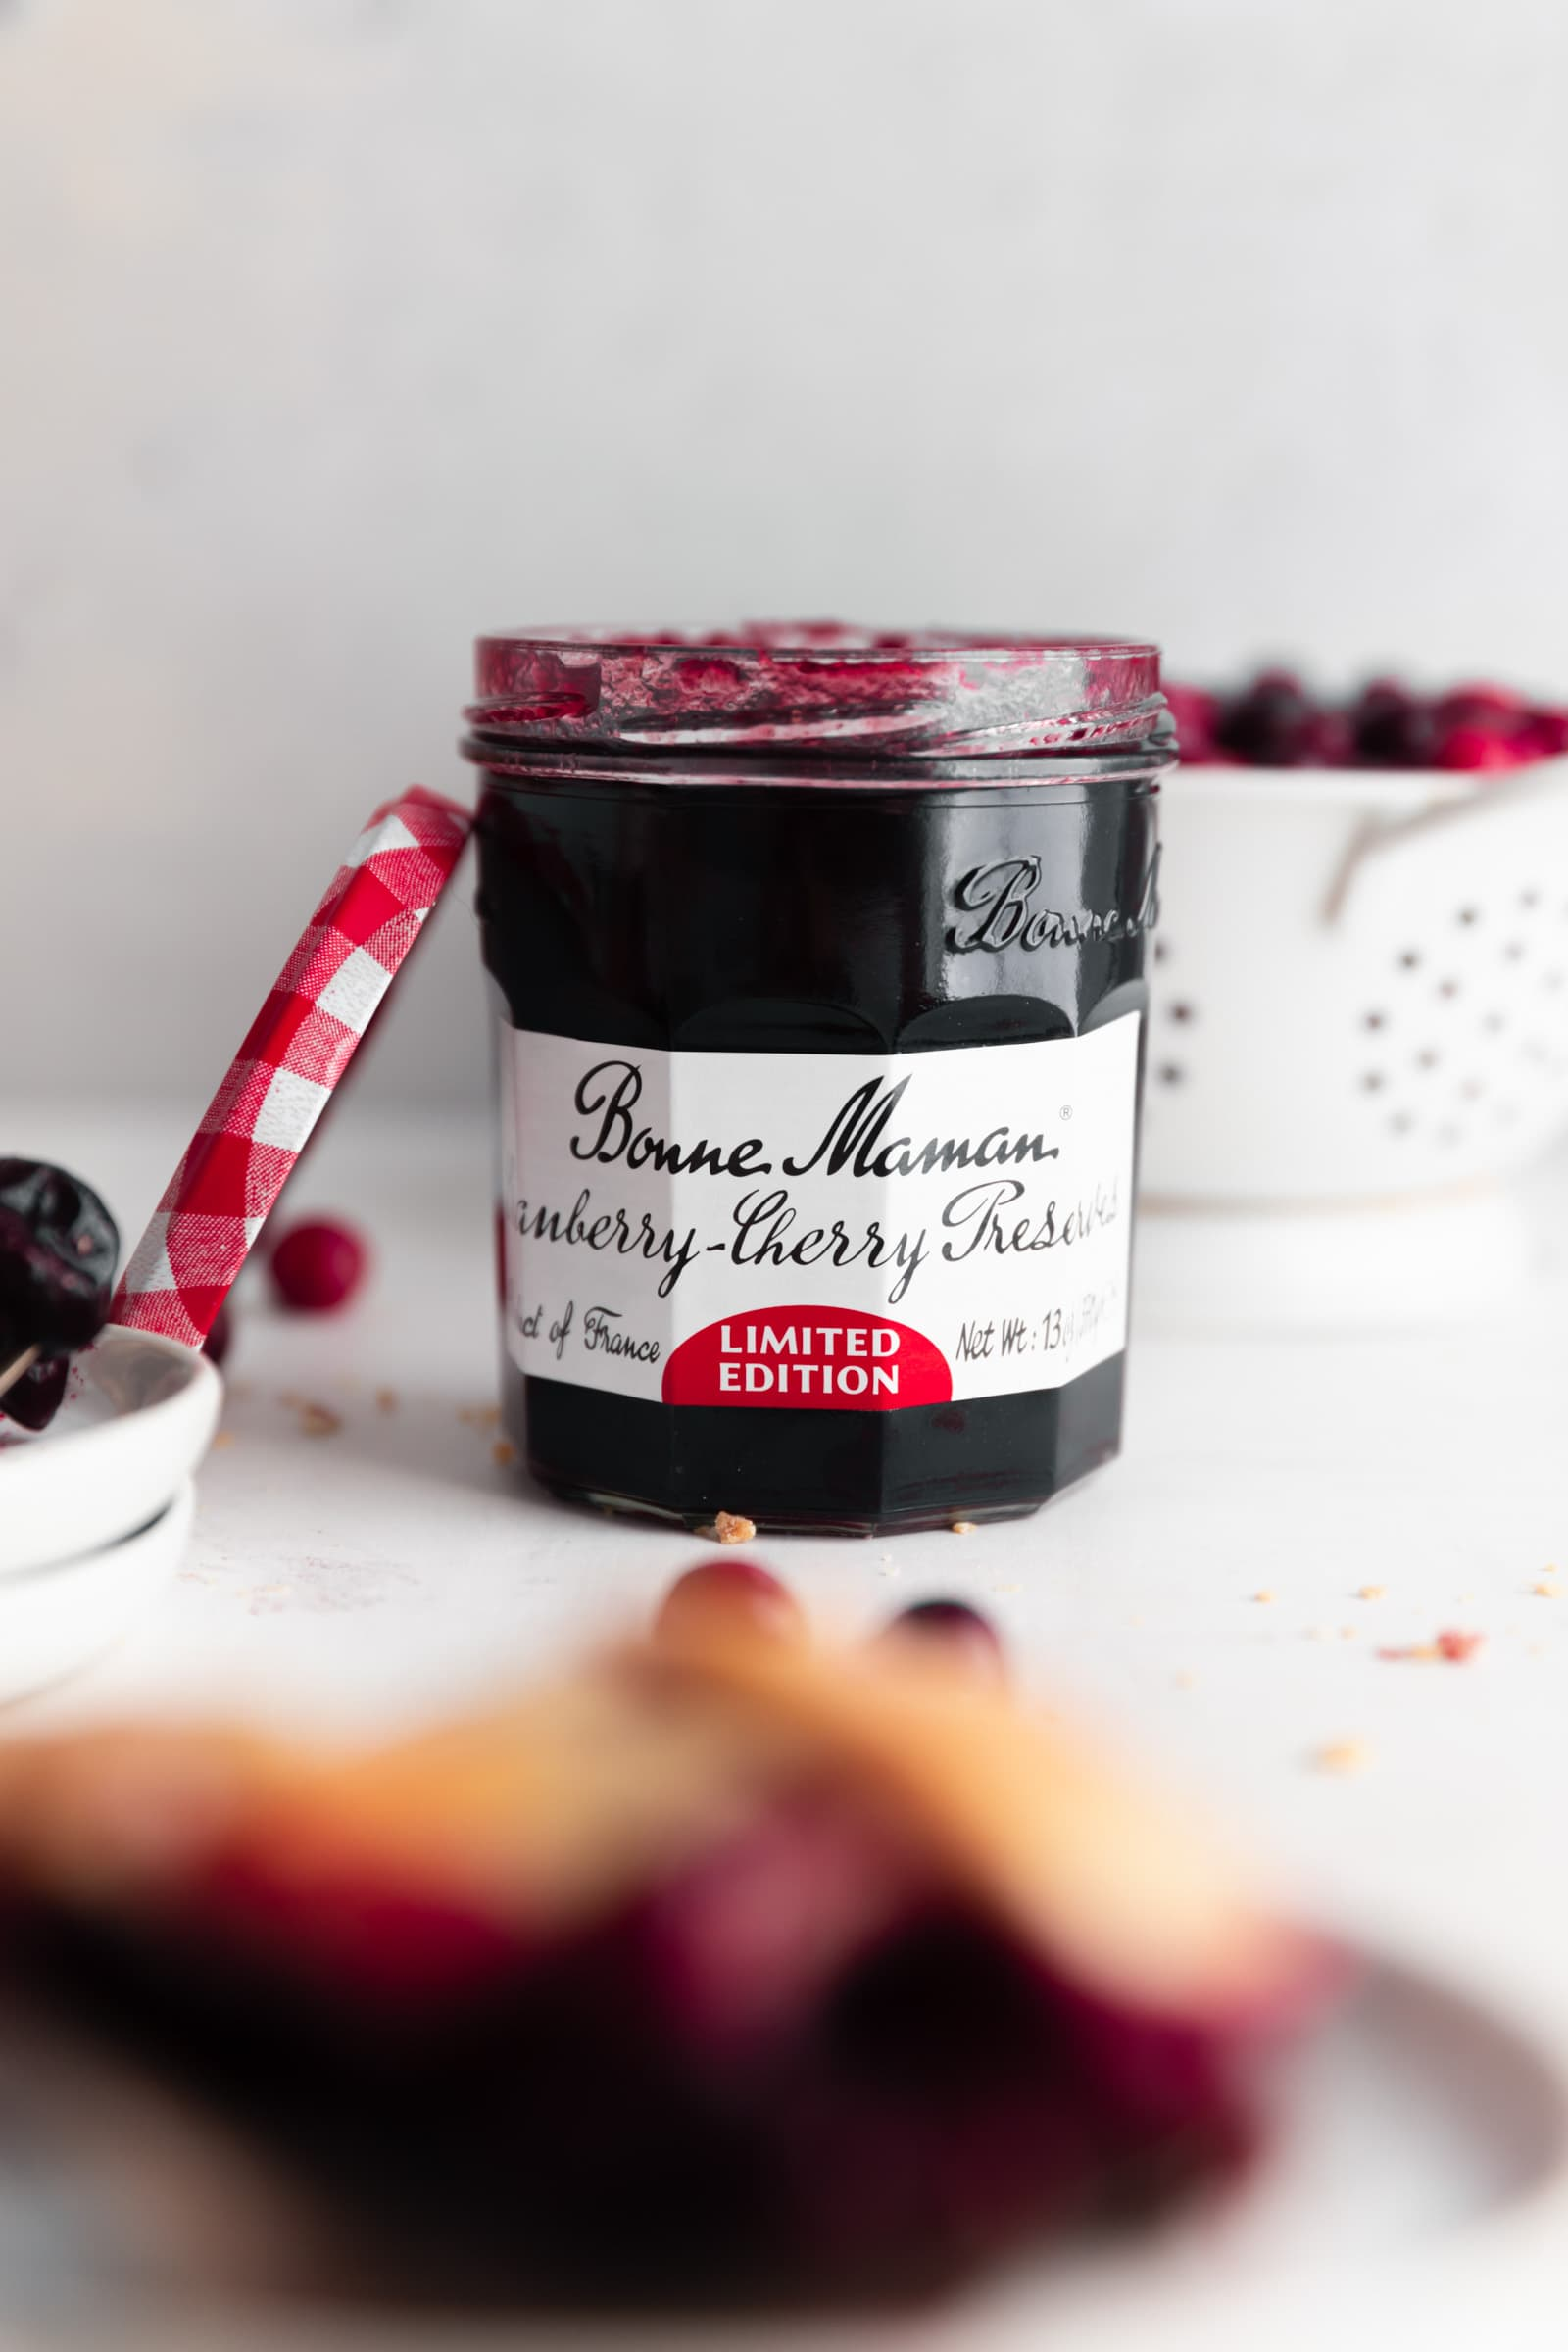 bonne maman cranberry cherry preserves